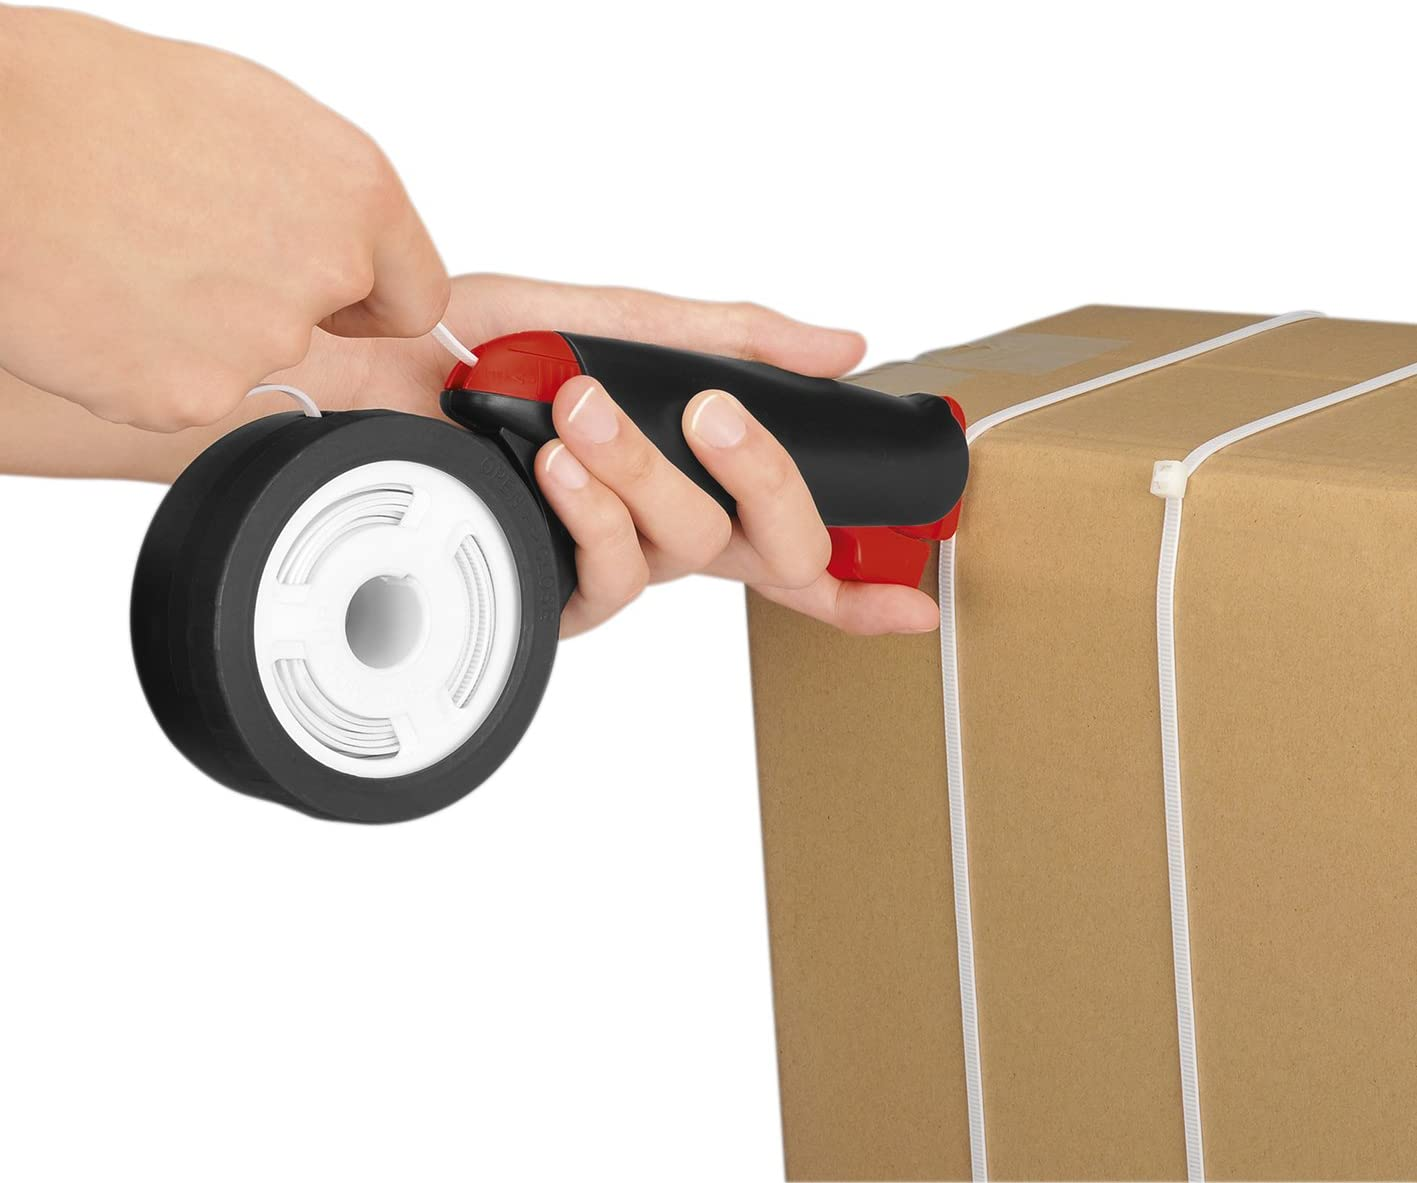 Verpackungshilfe Alles Bündler 2.0 Bündelpistole Verschnür-Gerät EASYMAXX NEU *